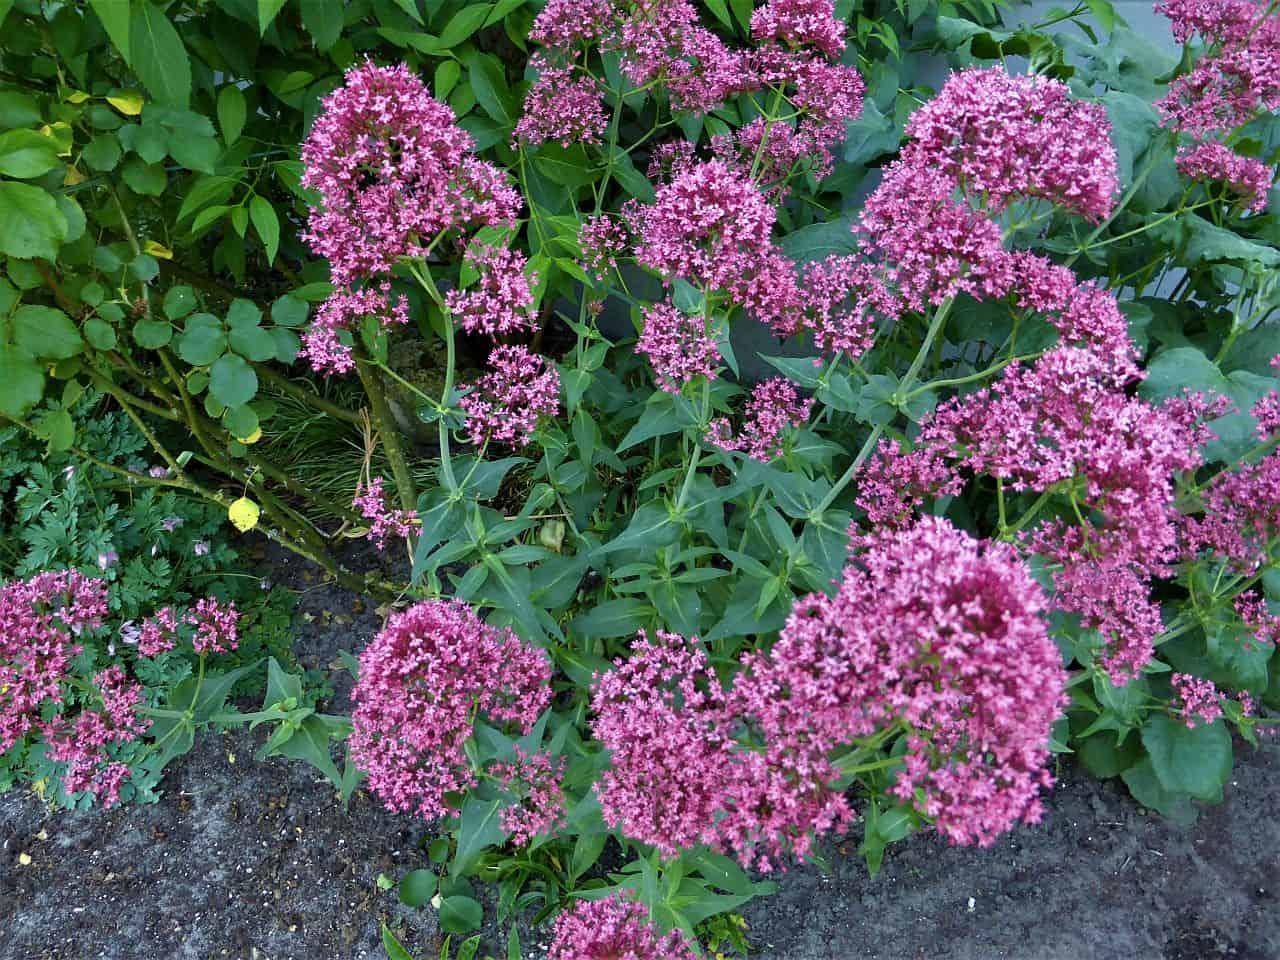 Lilafarbene Spornblume